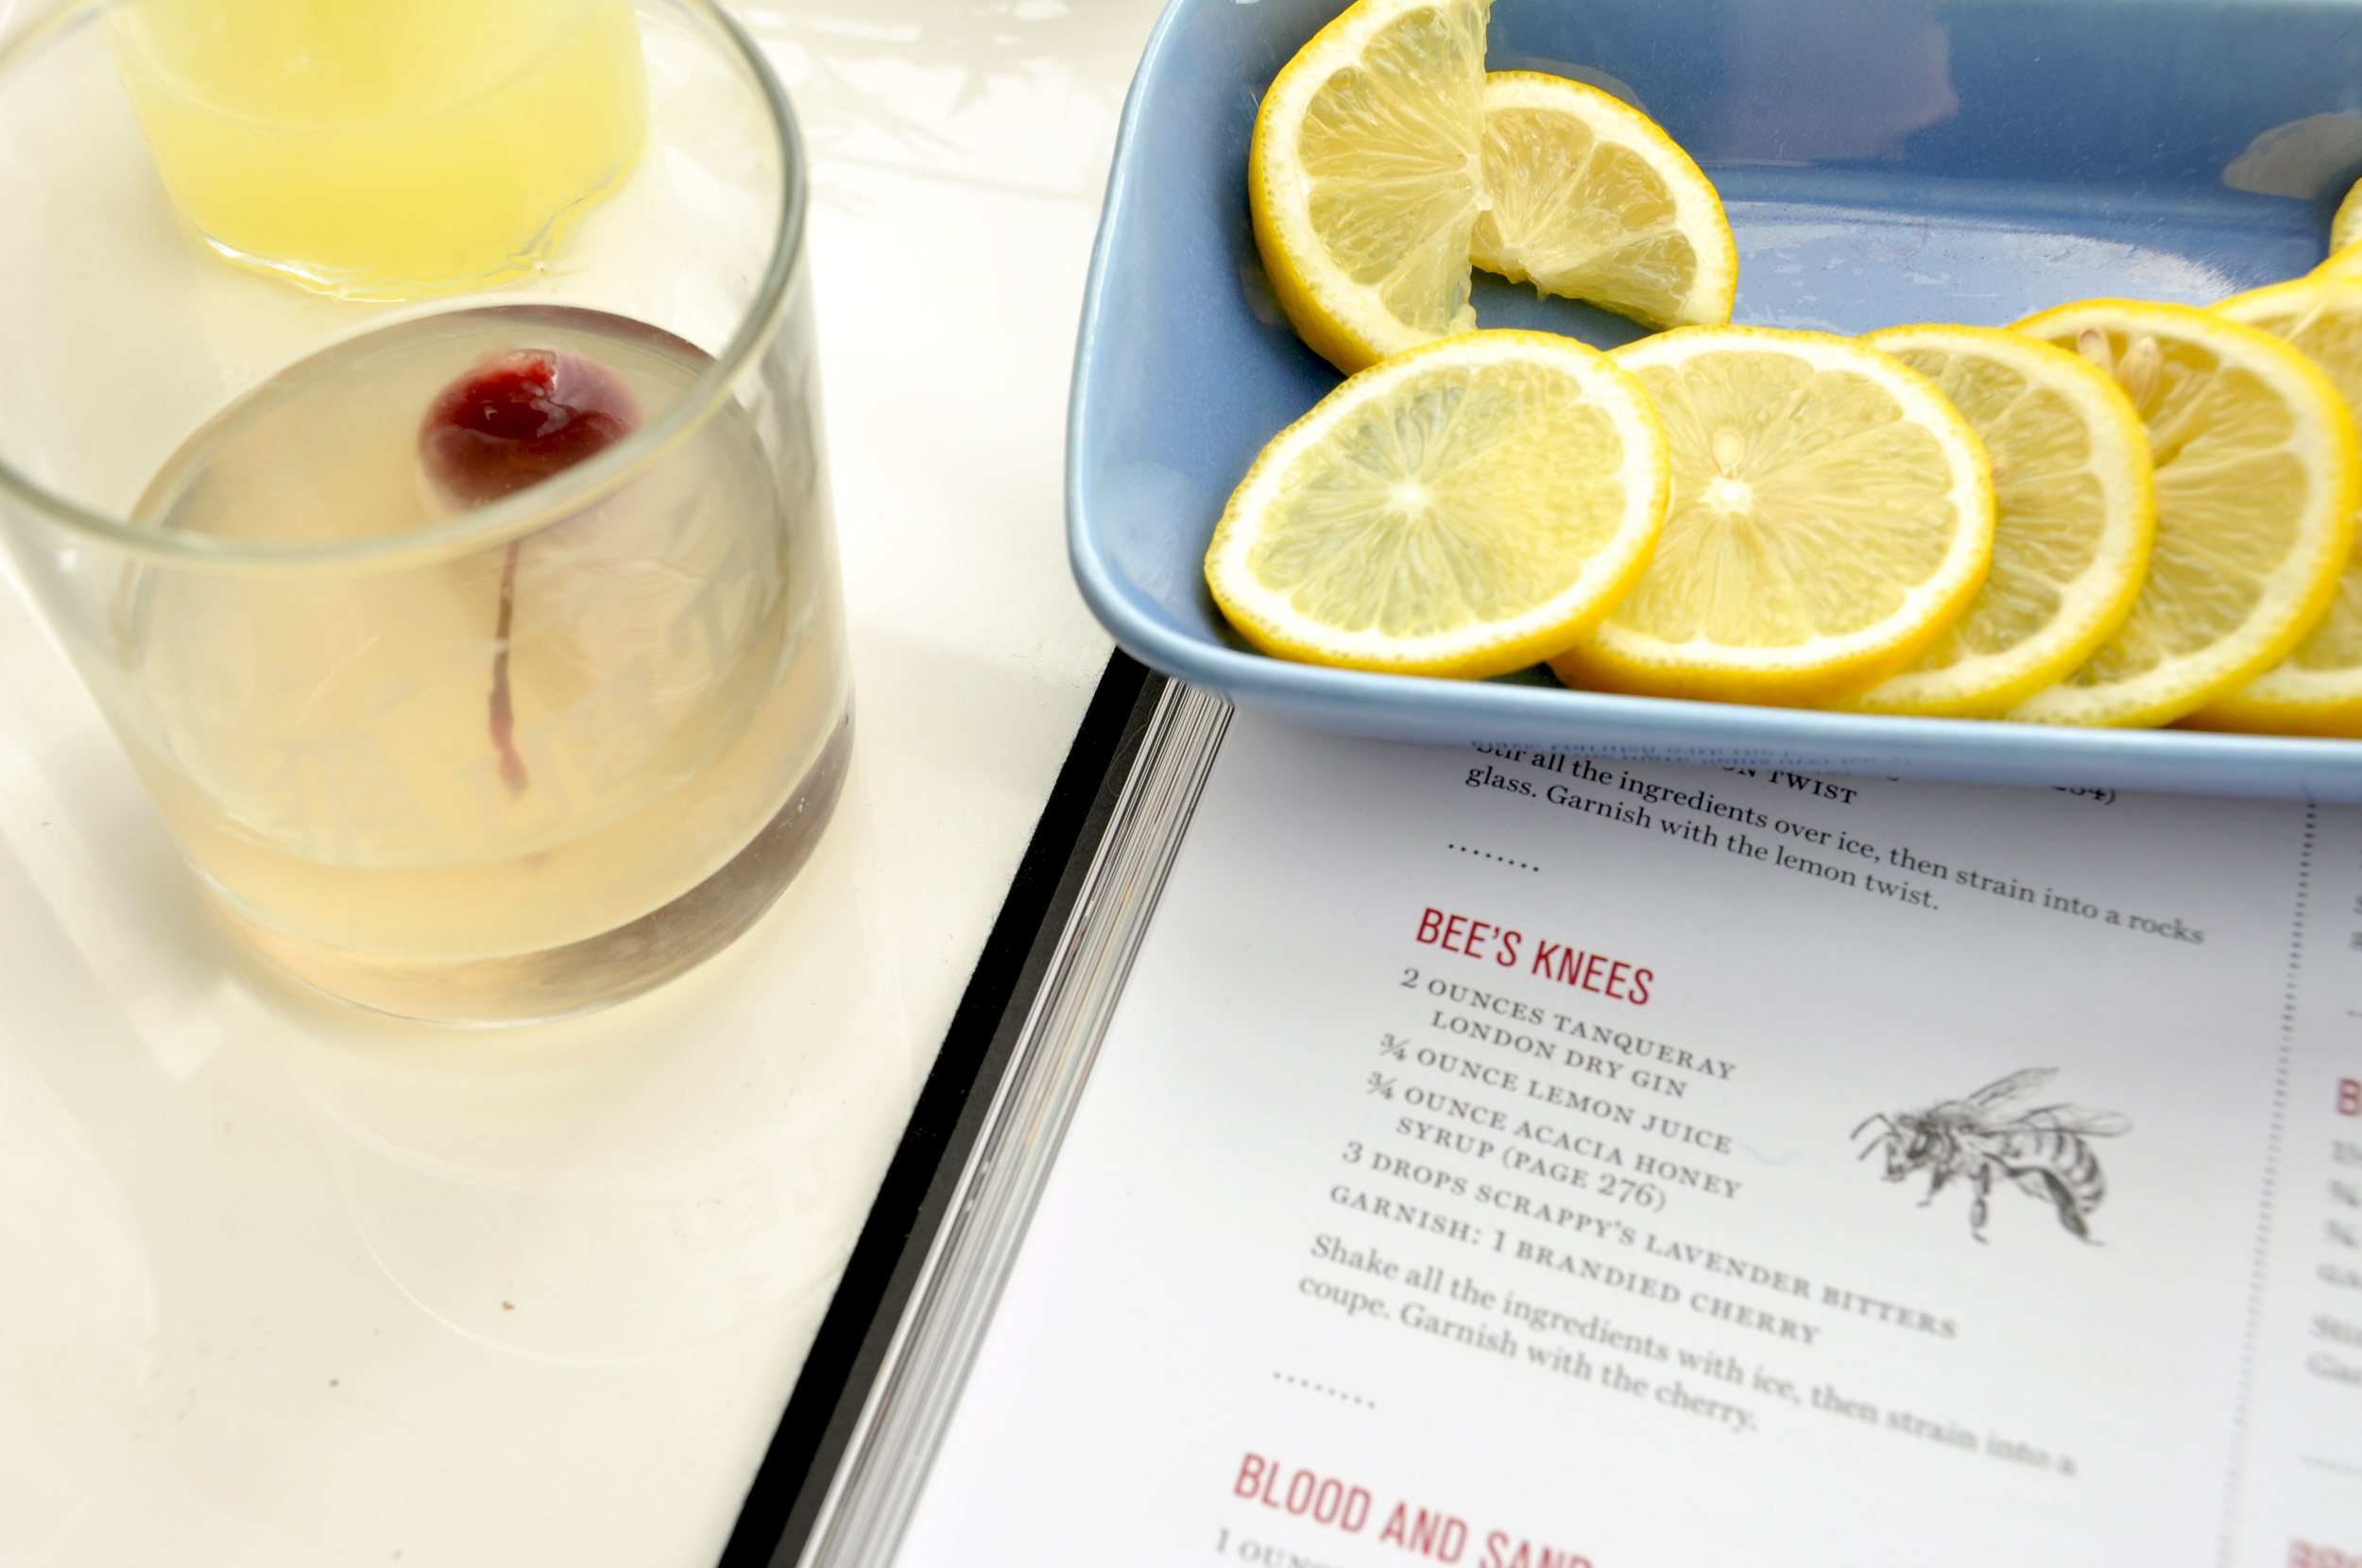 BEE'S KNEES DRINK RECIPE AUSTIN TEXAS BARWARE